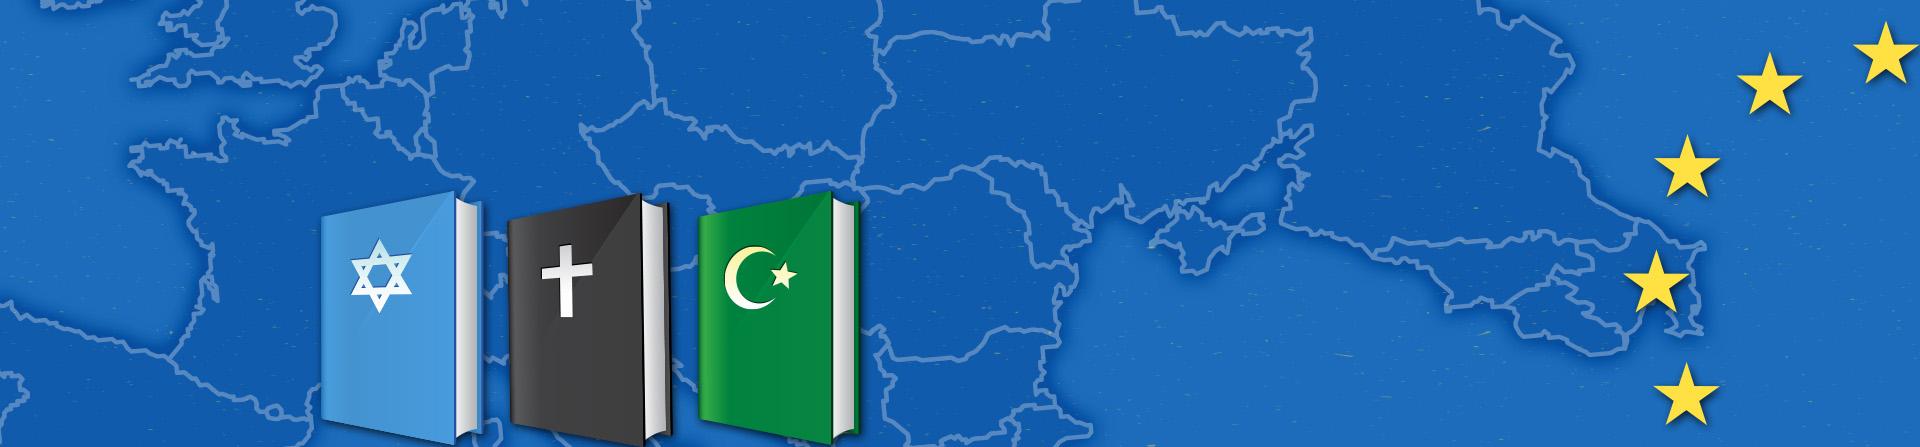 BA_IRDEIC_Religions Europe_2019.jpg